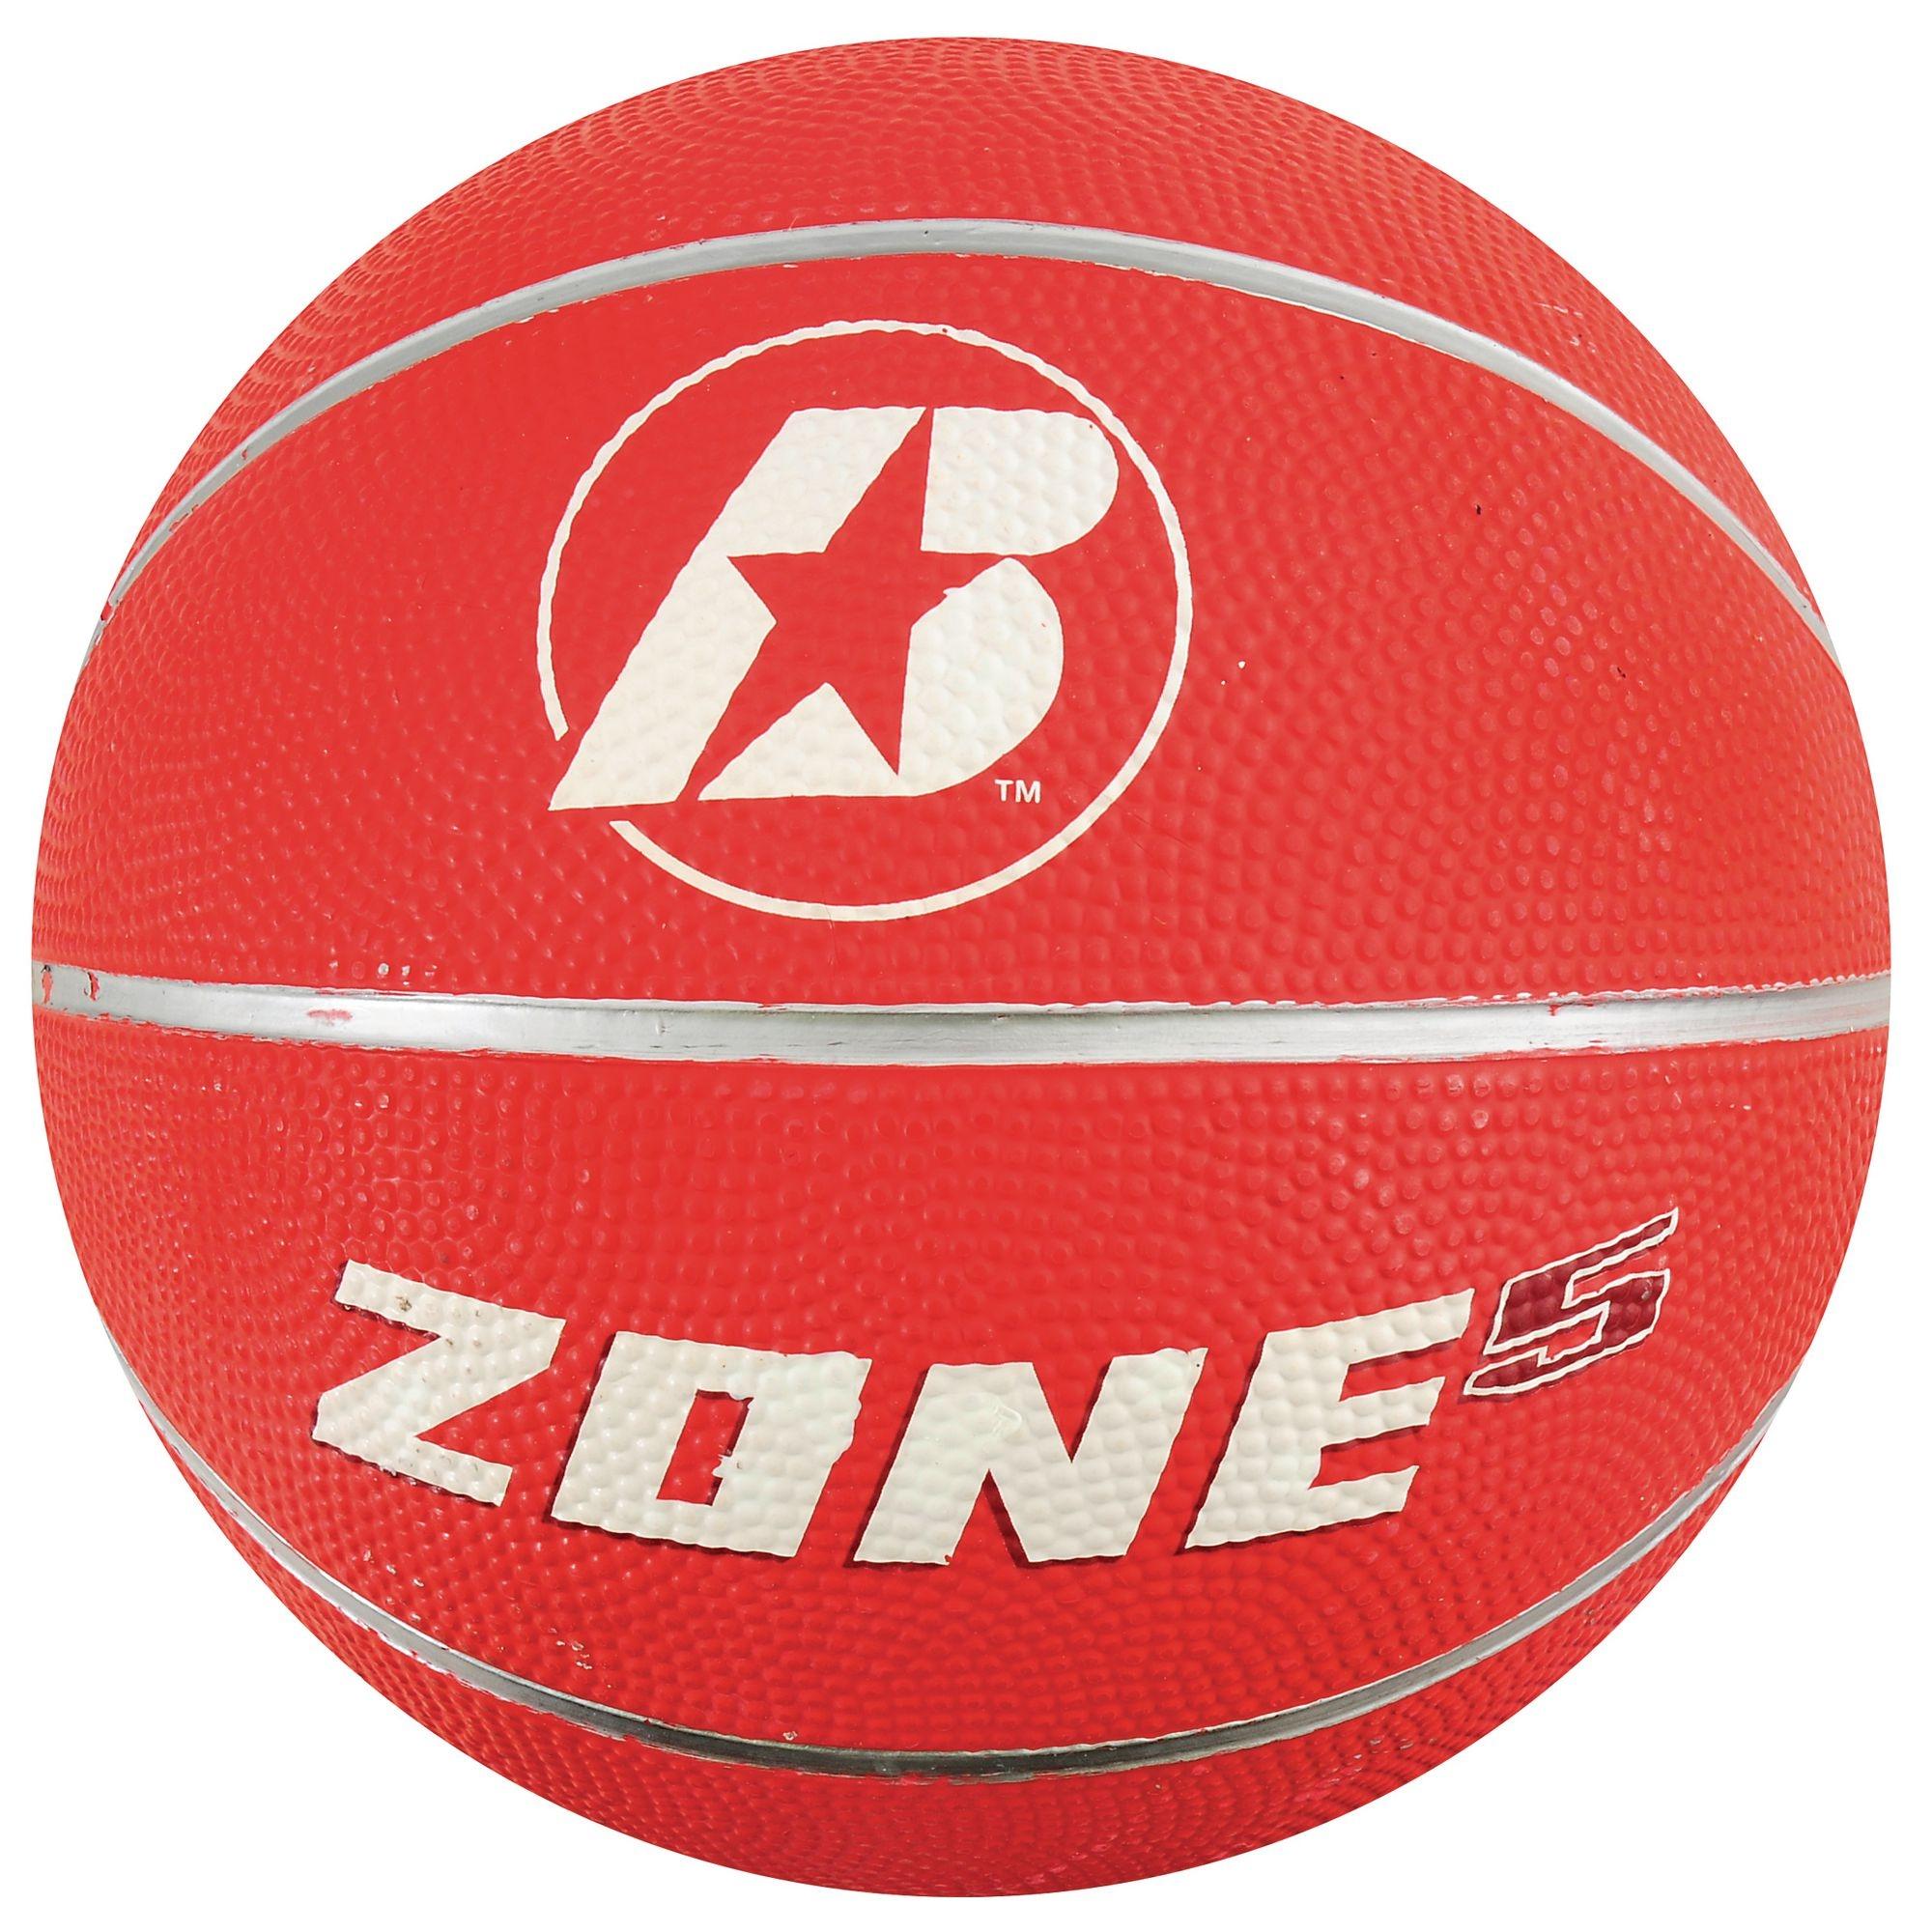 Bden Zone Basketball - Purple - Size 5